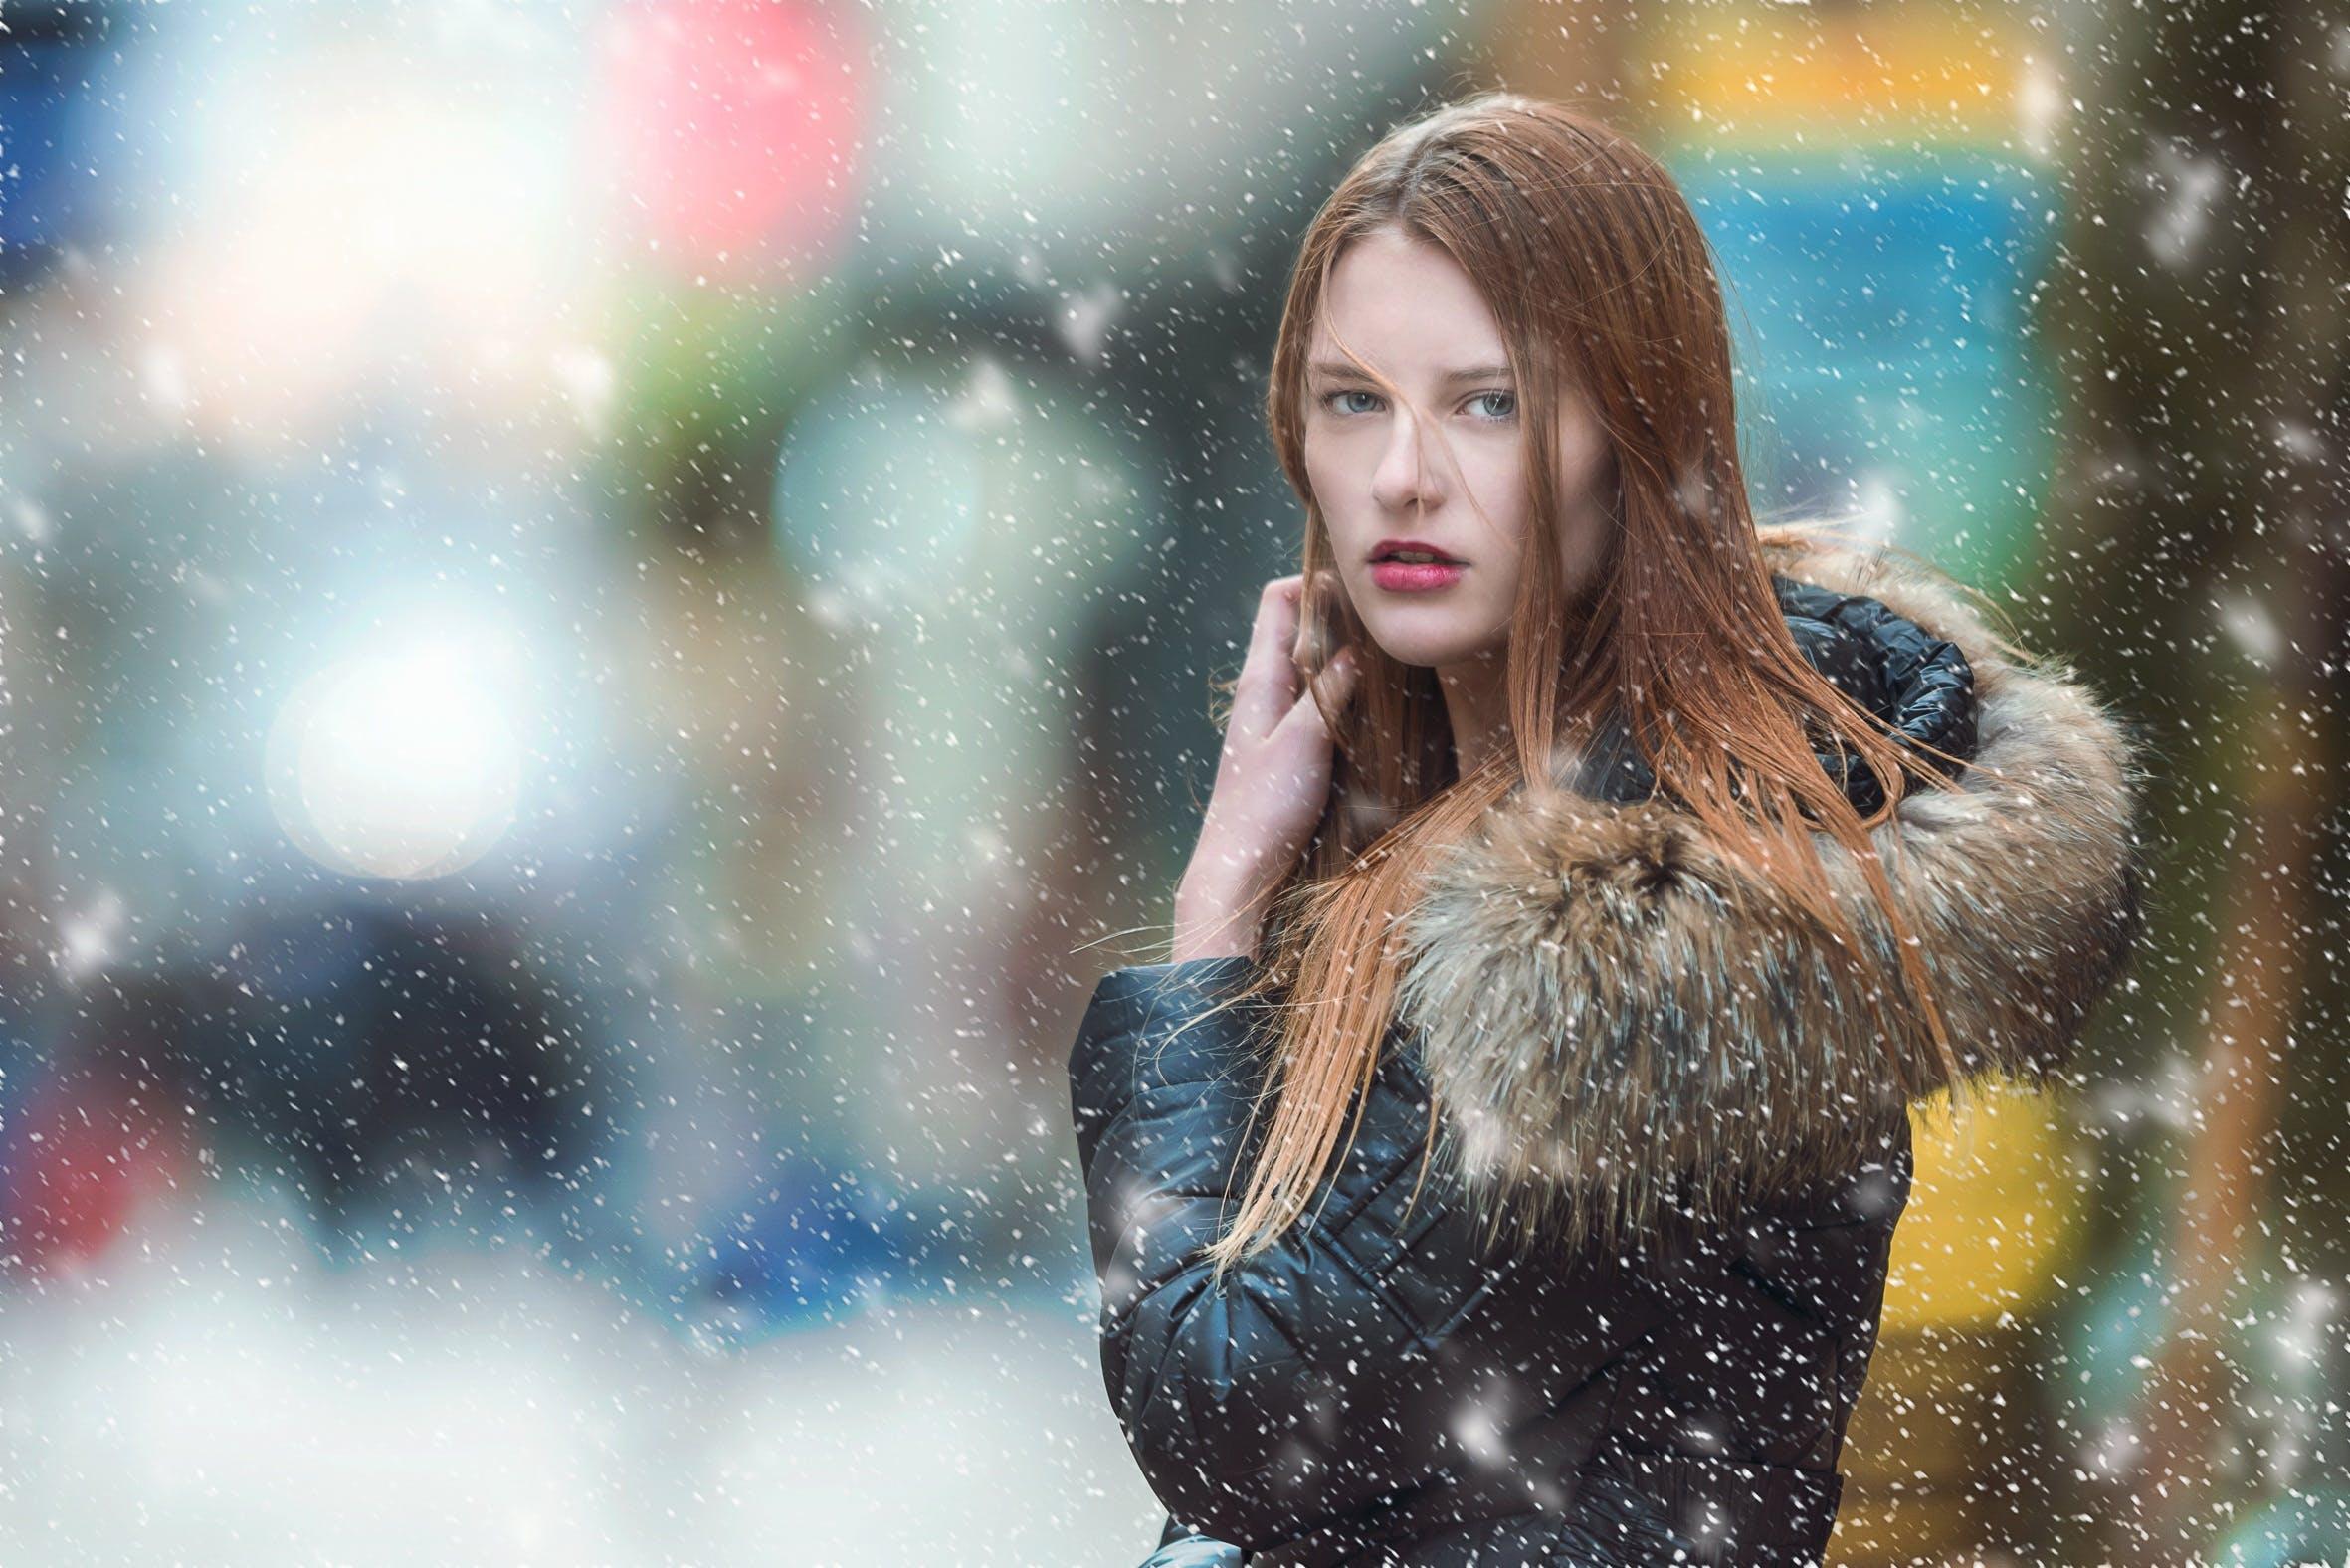 Woman Standing Outdoor Wearing Parka Jacket